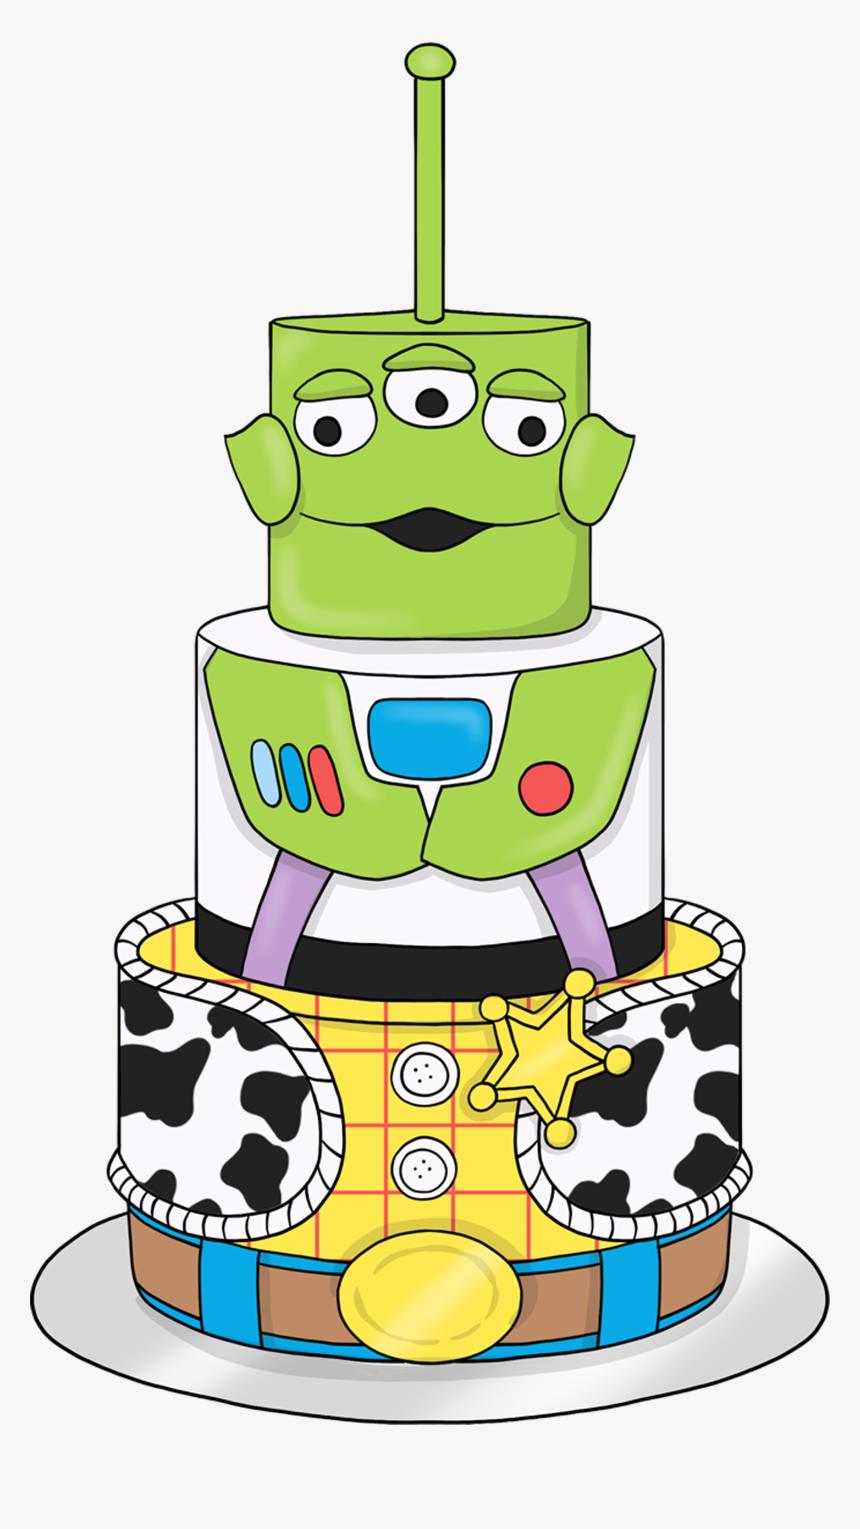 Phenomenal Toystory Birthdaycake Alien Buzzlightyear Woody Cartoon Hd Funny Birthday Cards Online Inifodamsfinfo